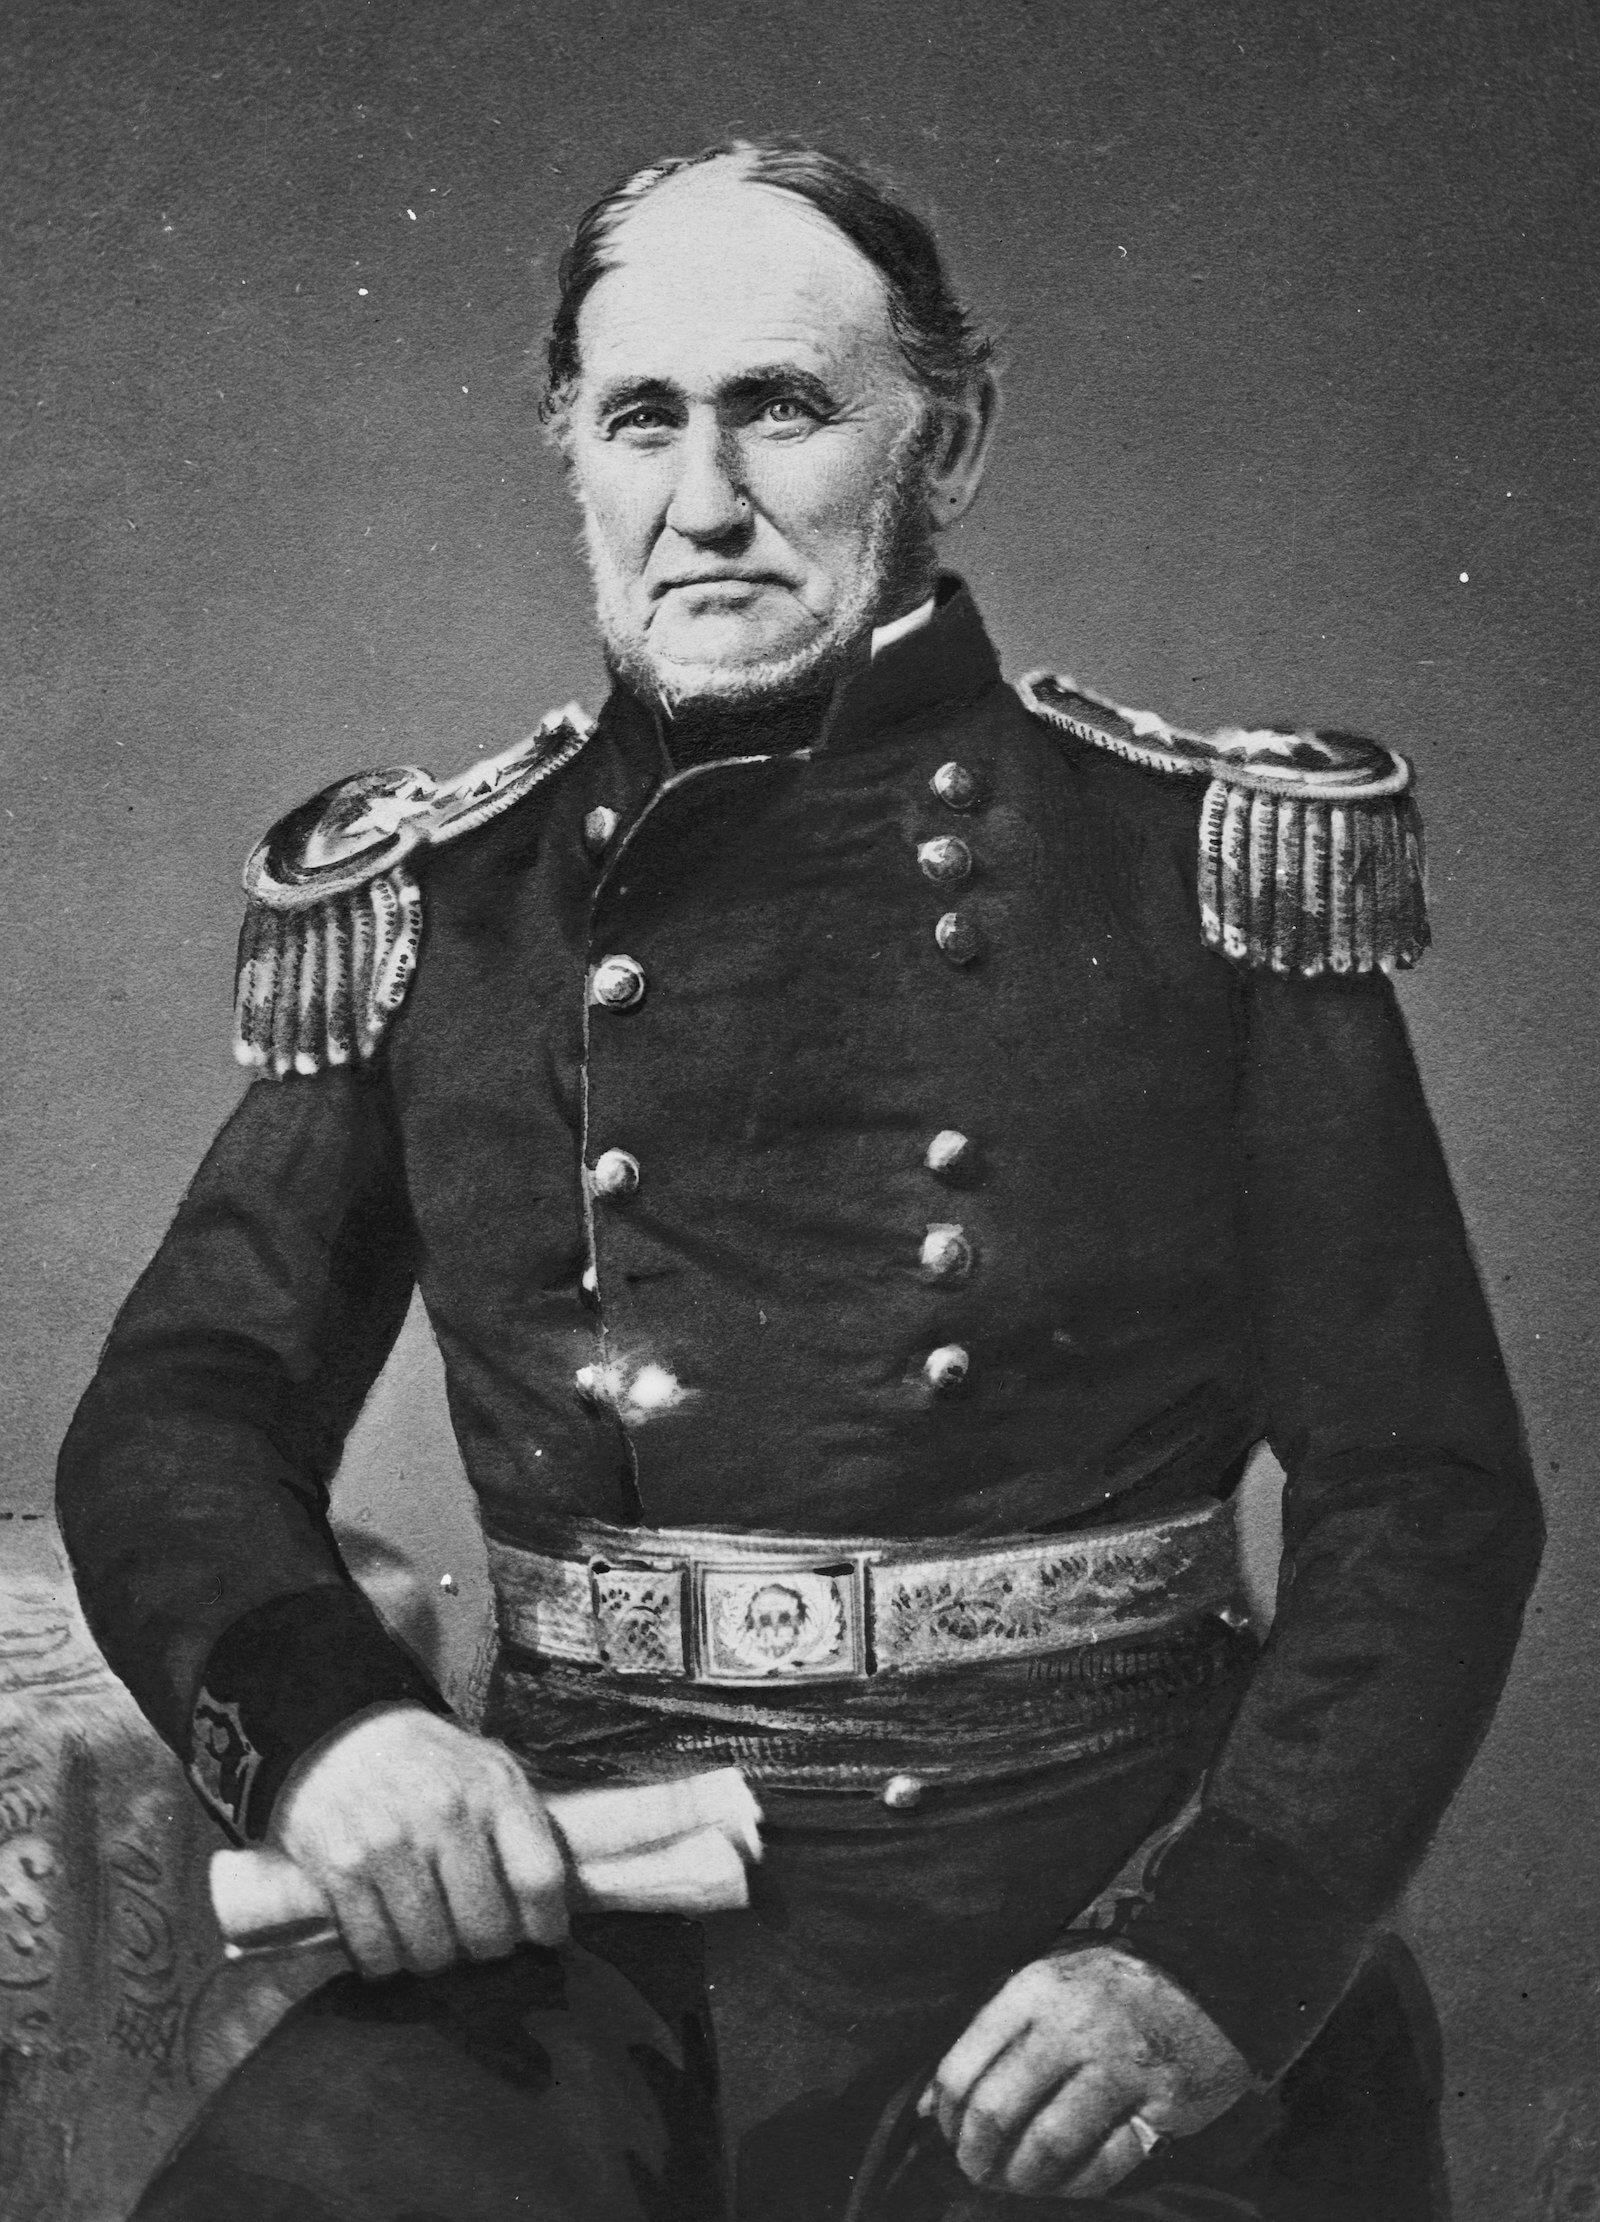 David E. Twiggs Texas